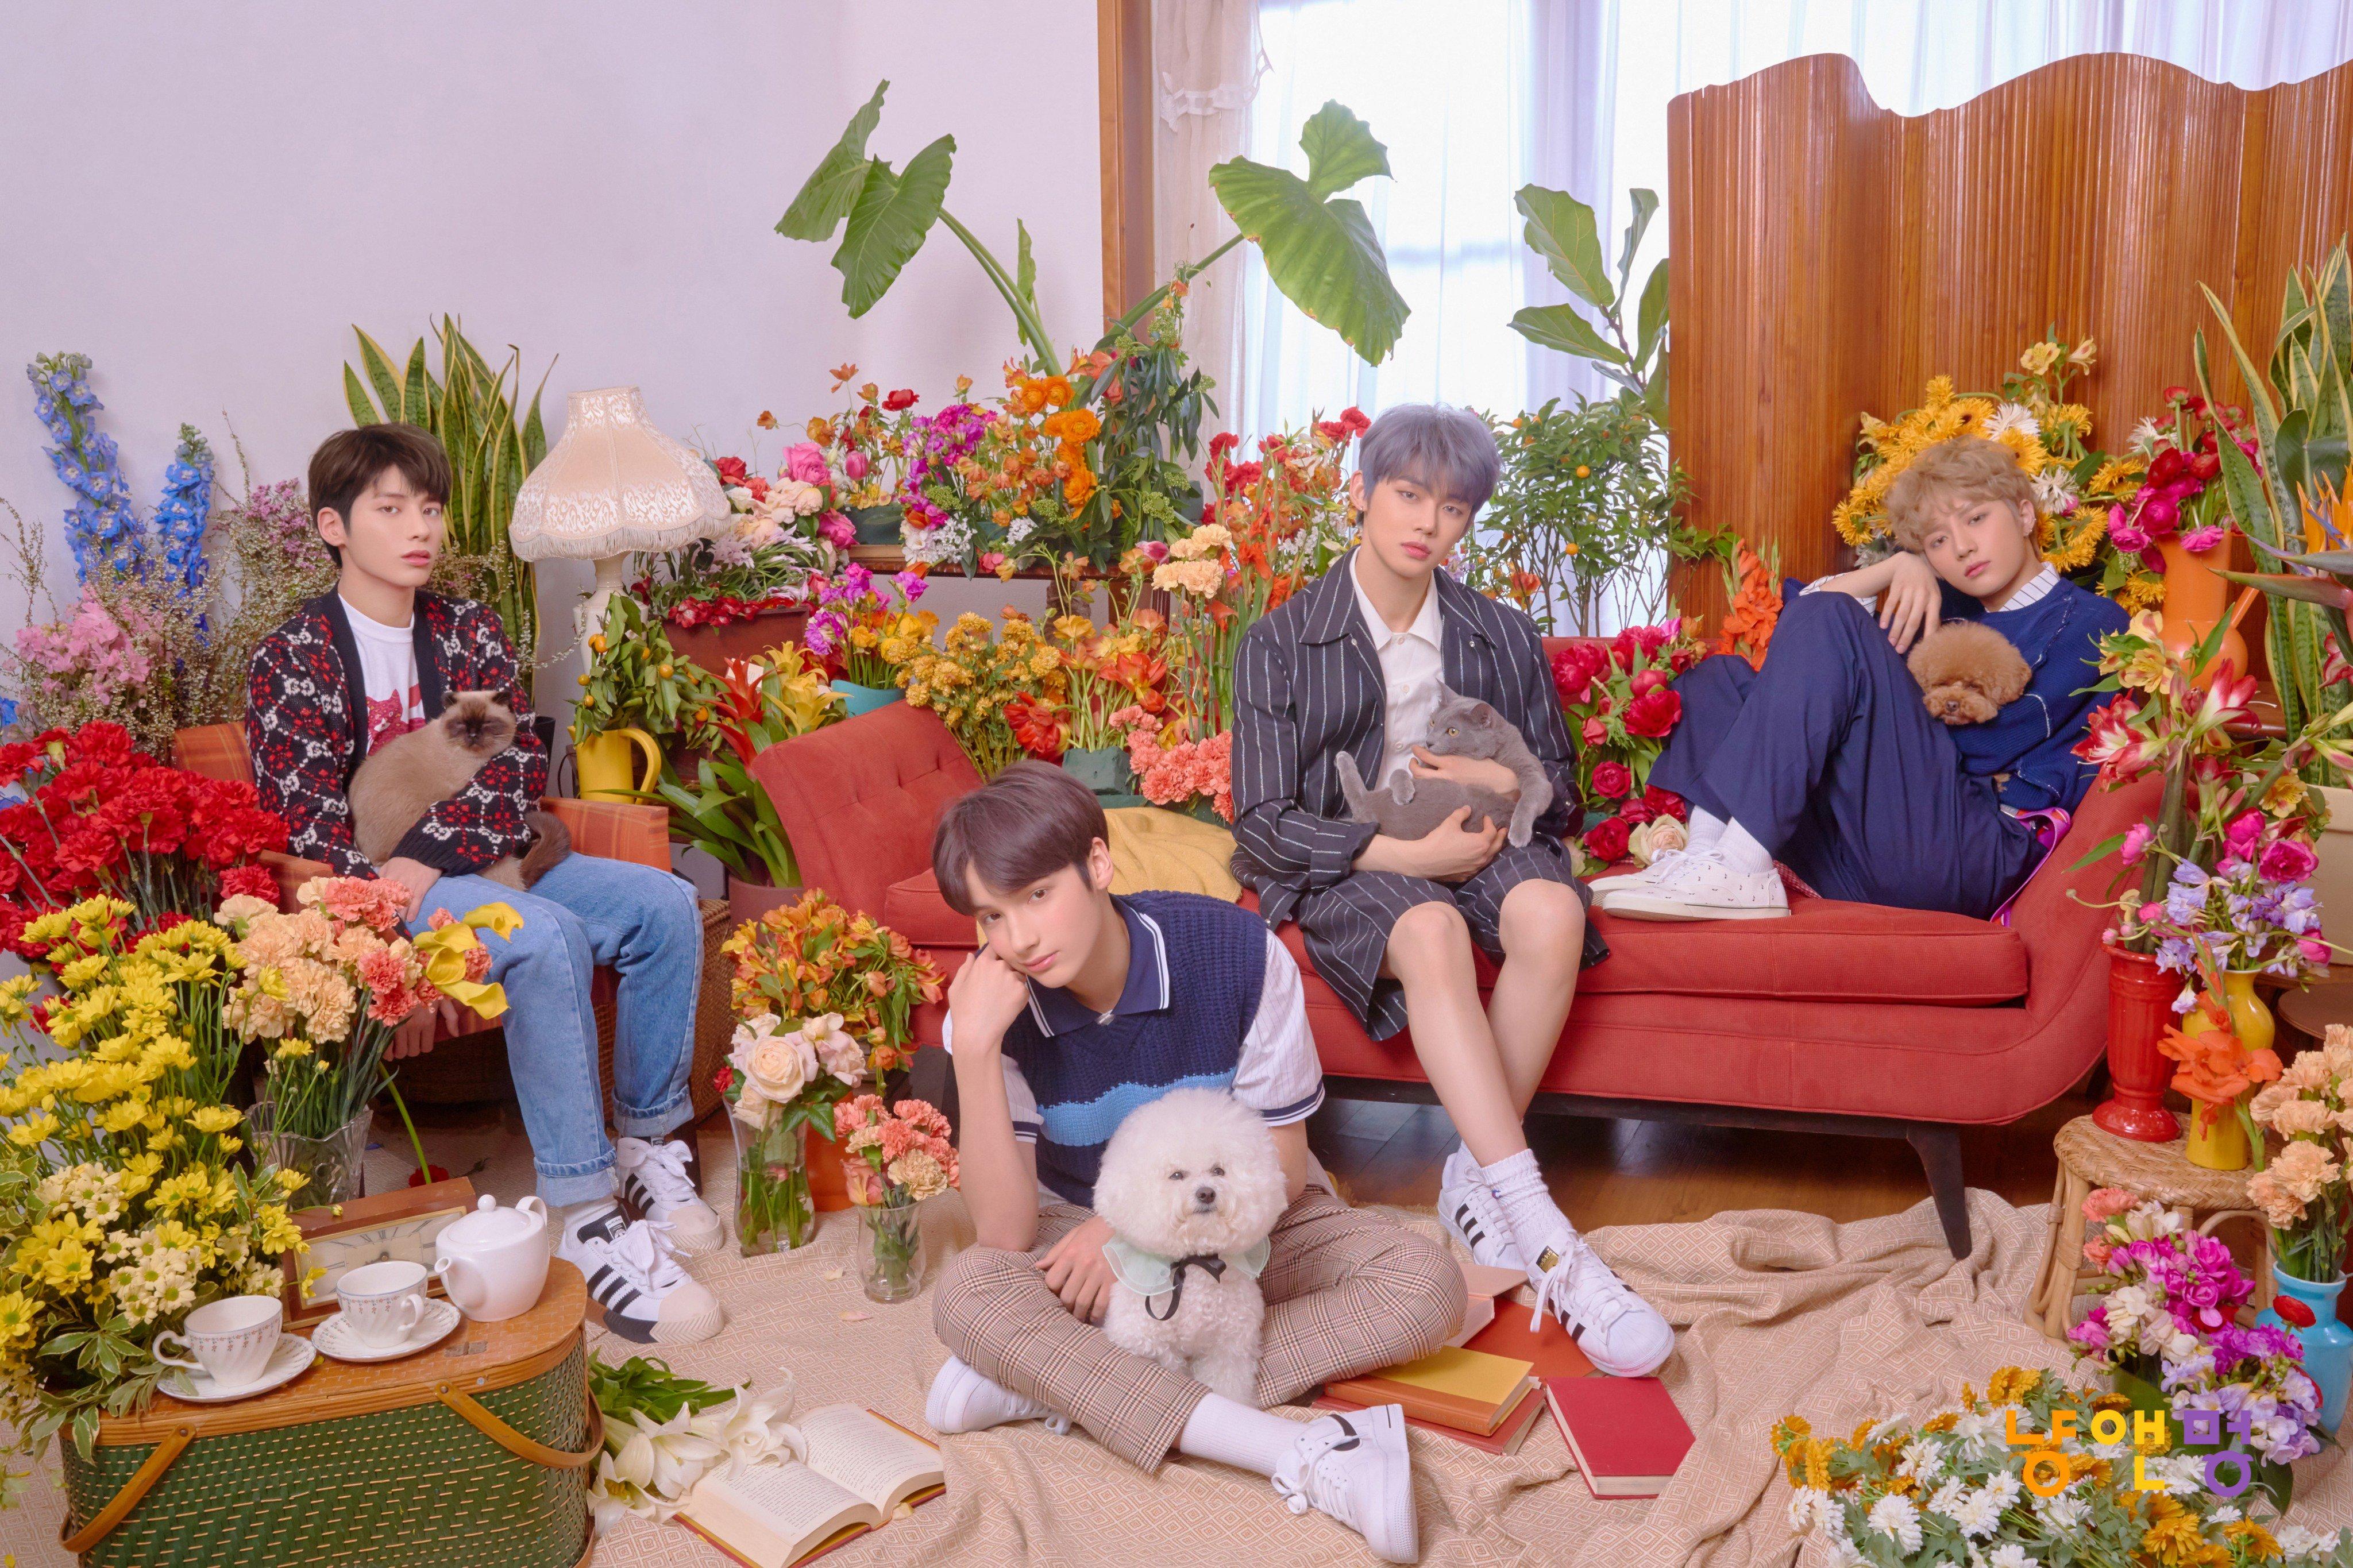 Shinee Dream Girl Wallpaper Txt Hueningkai Taehyun Cat Amp Dog Concept Photos K Pop